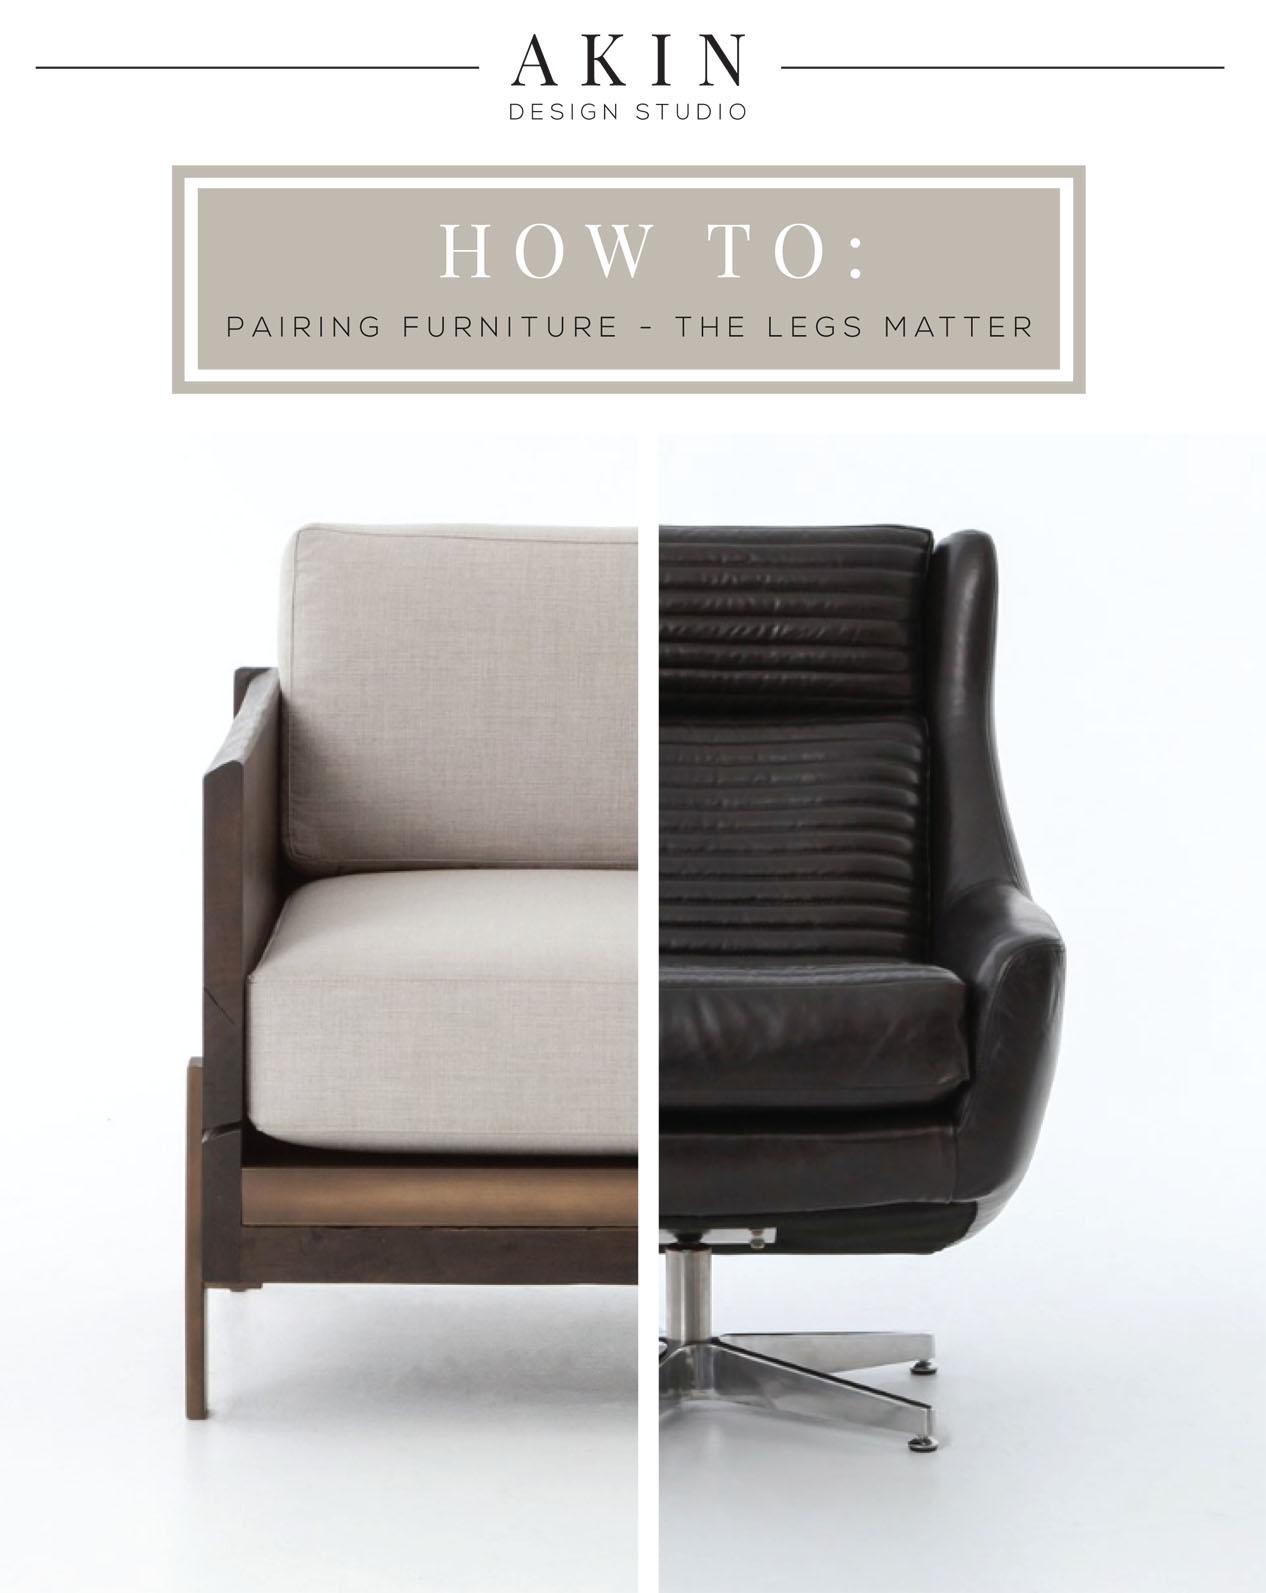 Akin Design Studio Blog | How to: Pairing furniture - The Legs Matter